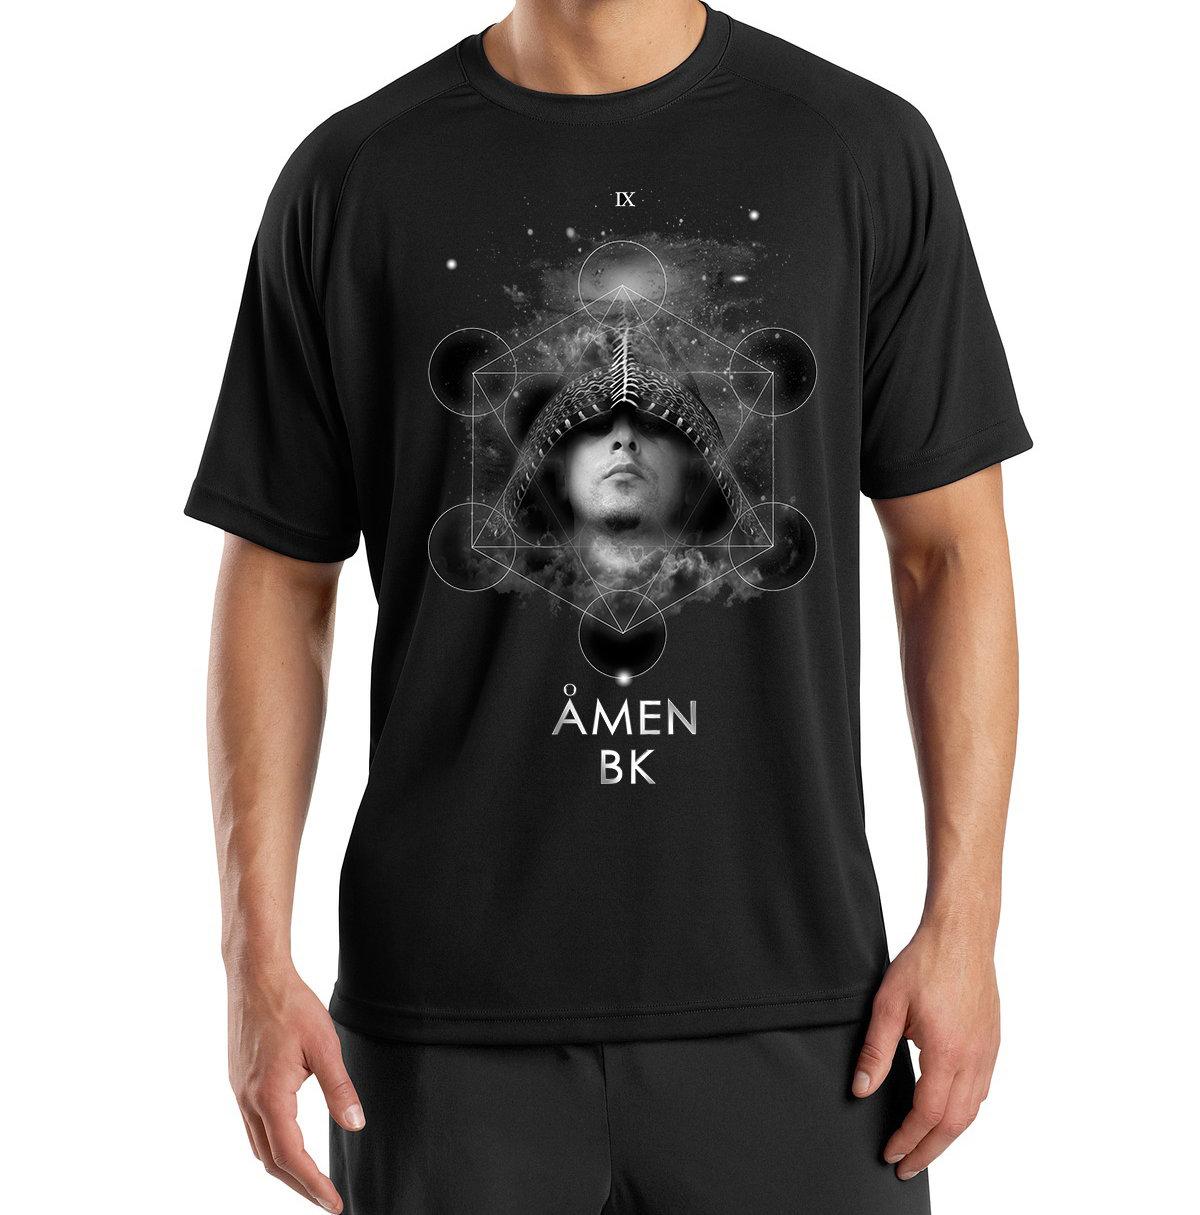 Amen BK T-Shirt